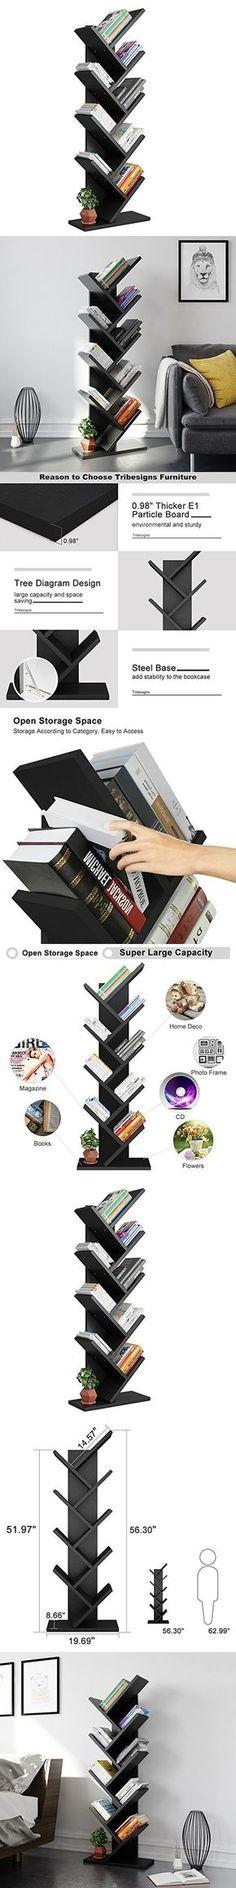 Tribesigns 9-Shelf Tree Shaped Bookcase Book Shelf Modern Stylish Kids Children Bookshelf Shelving Display Storage Rack for CD Book Home Office Decor (Black)